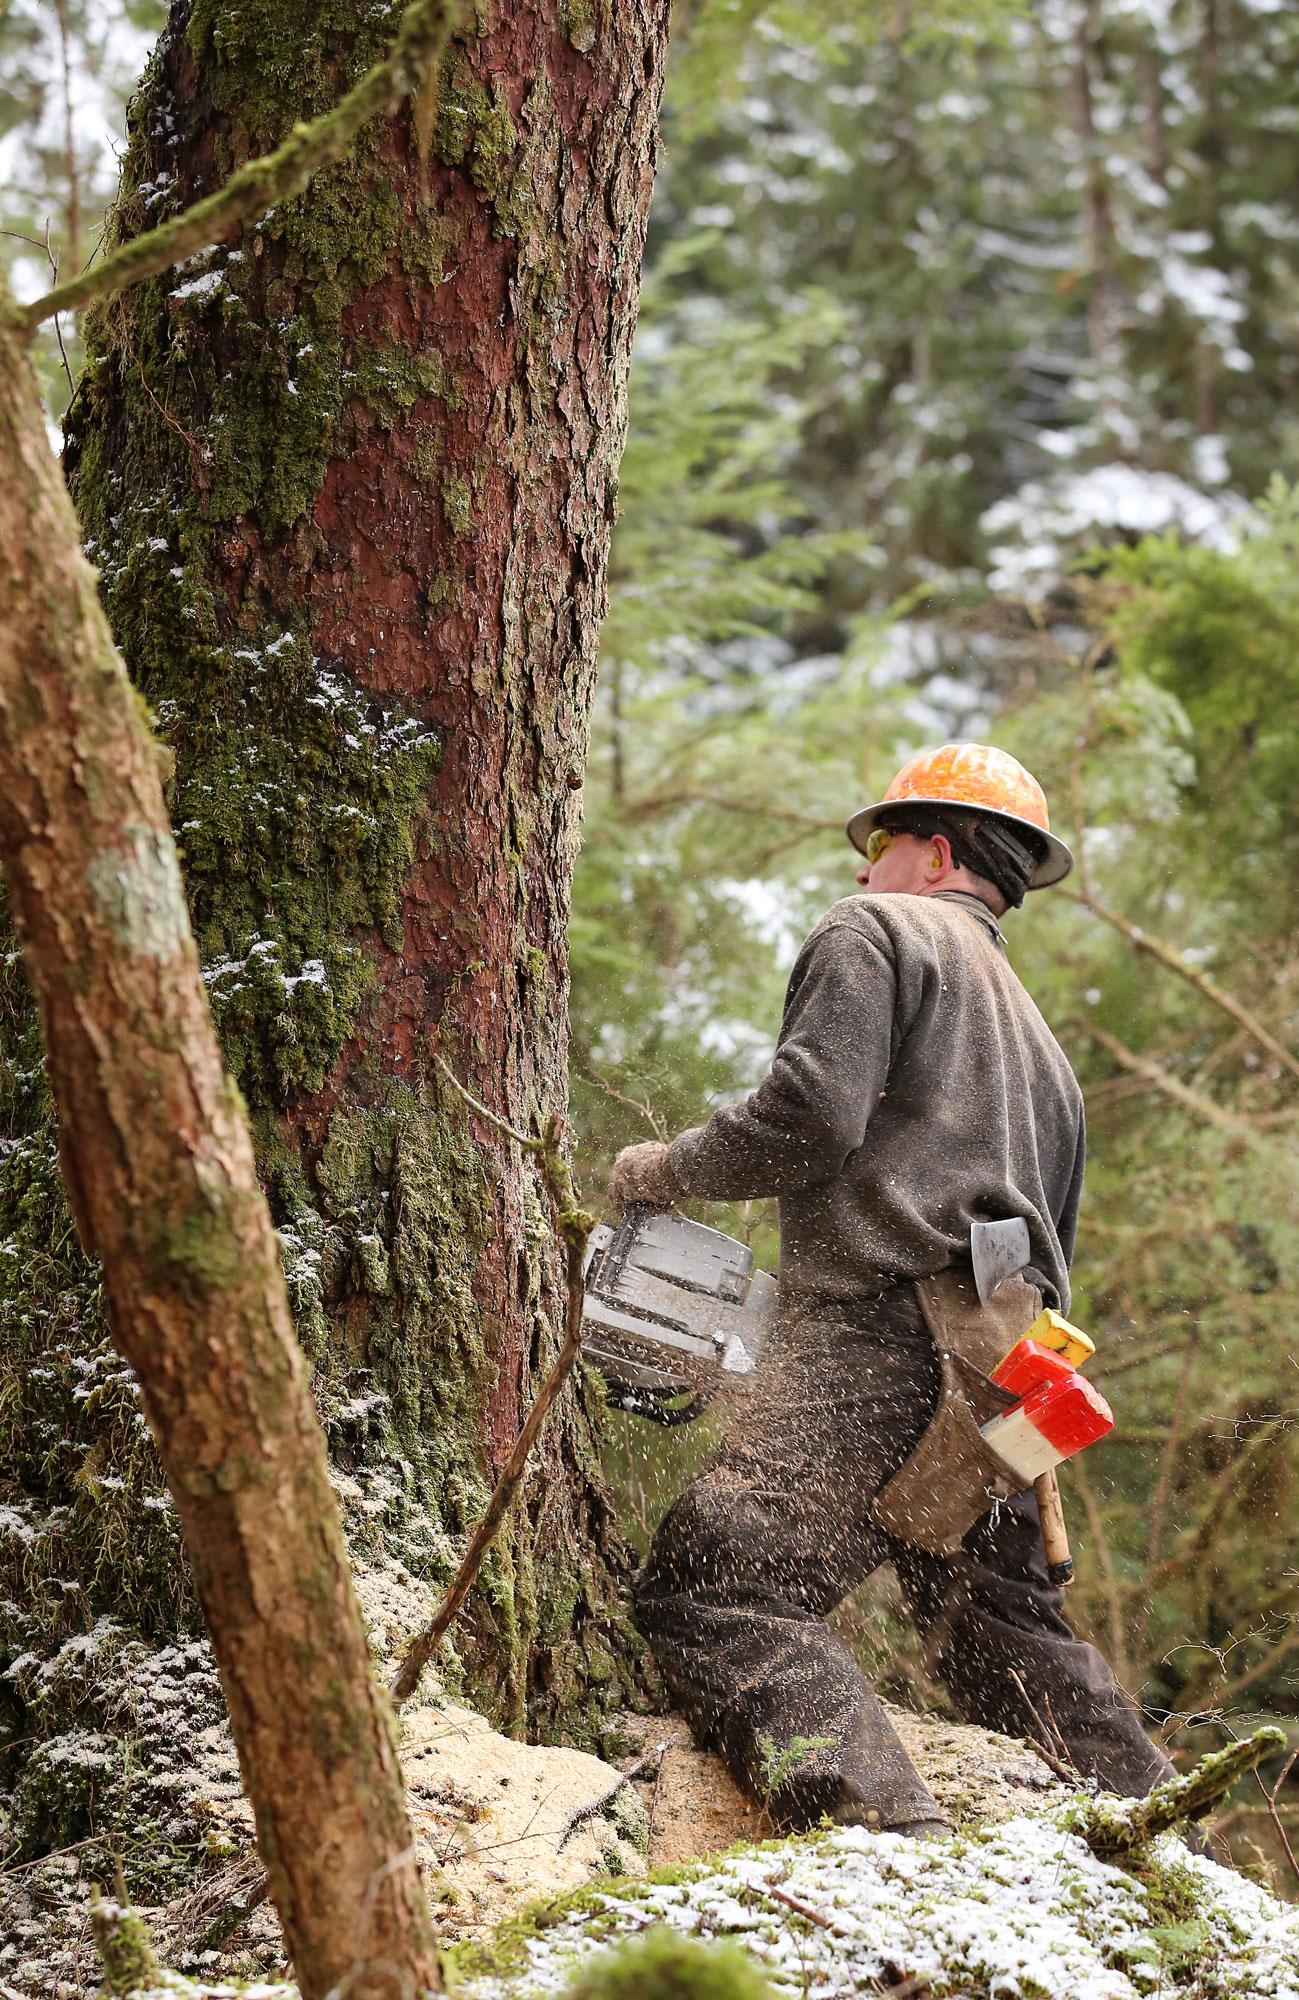 Logging logger cutter cutting tree Southeast Alaska